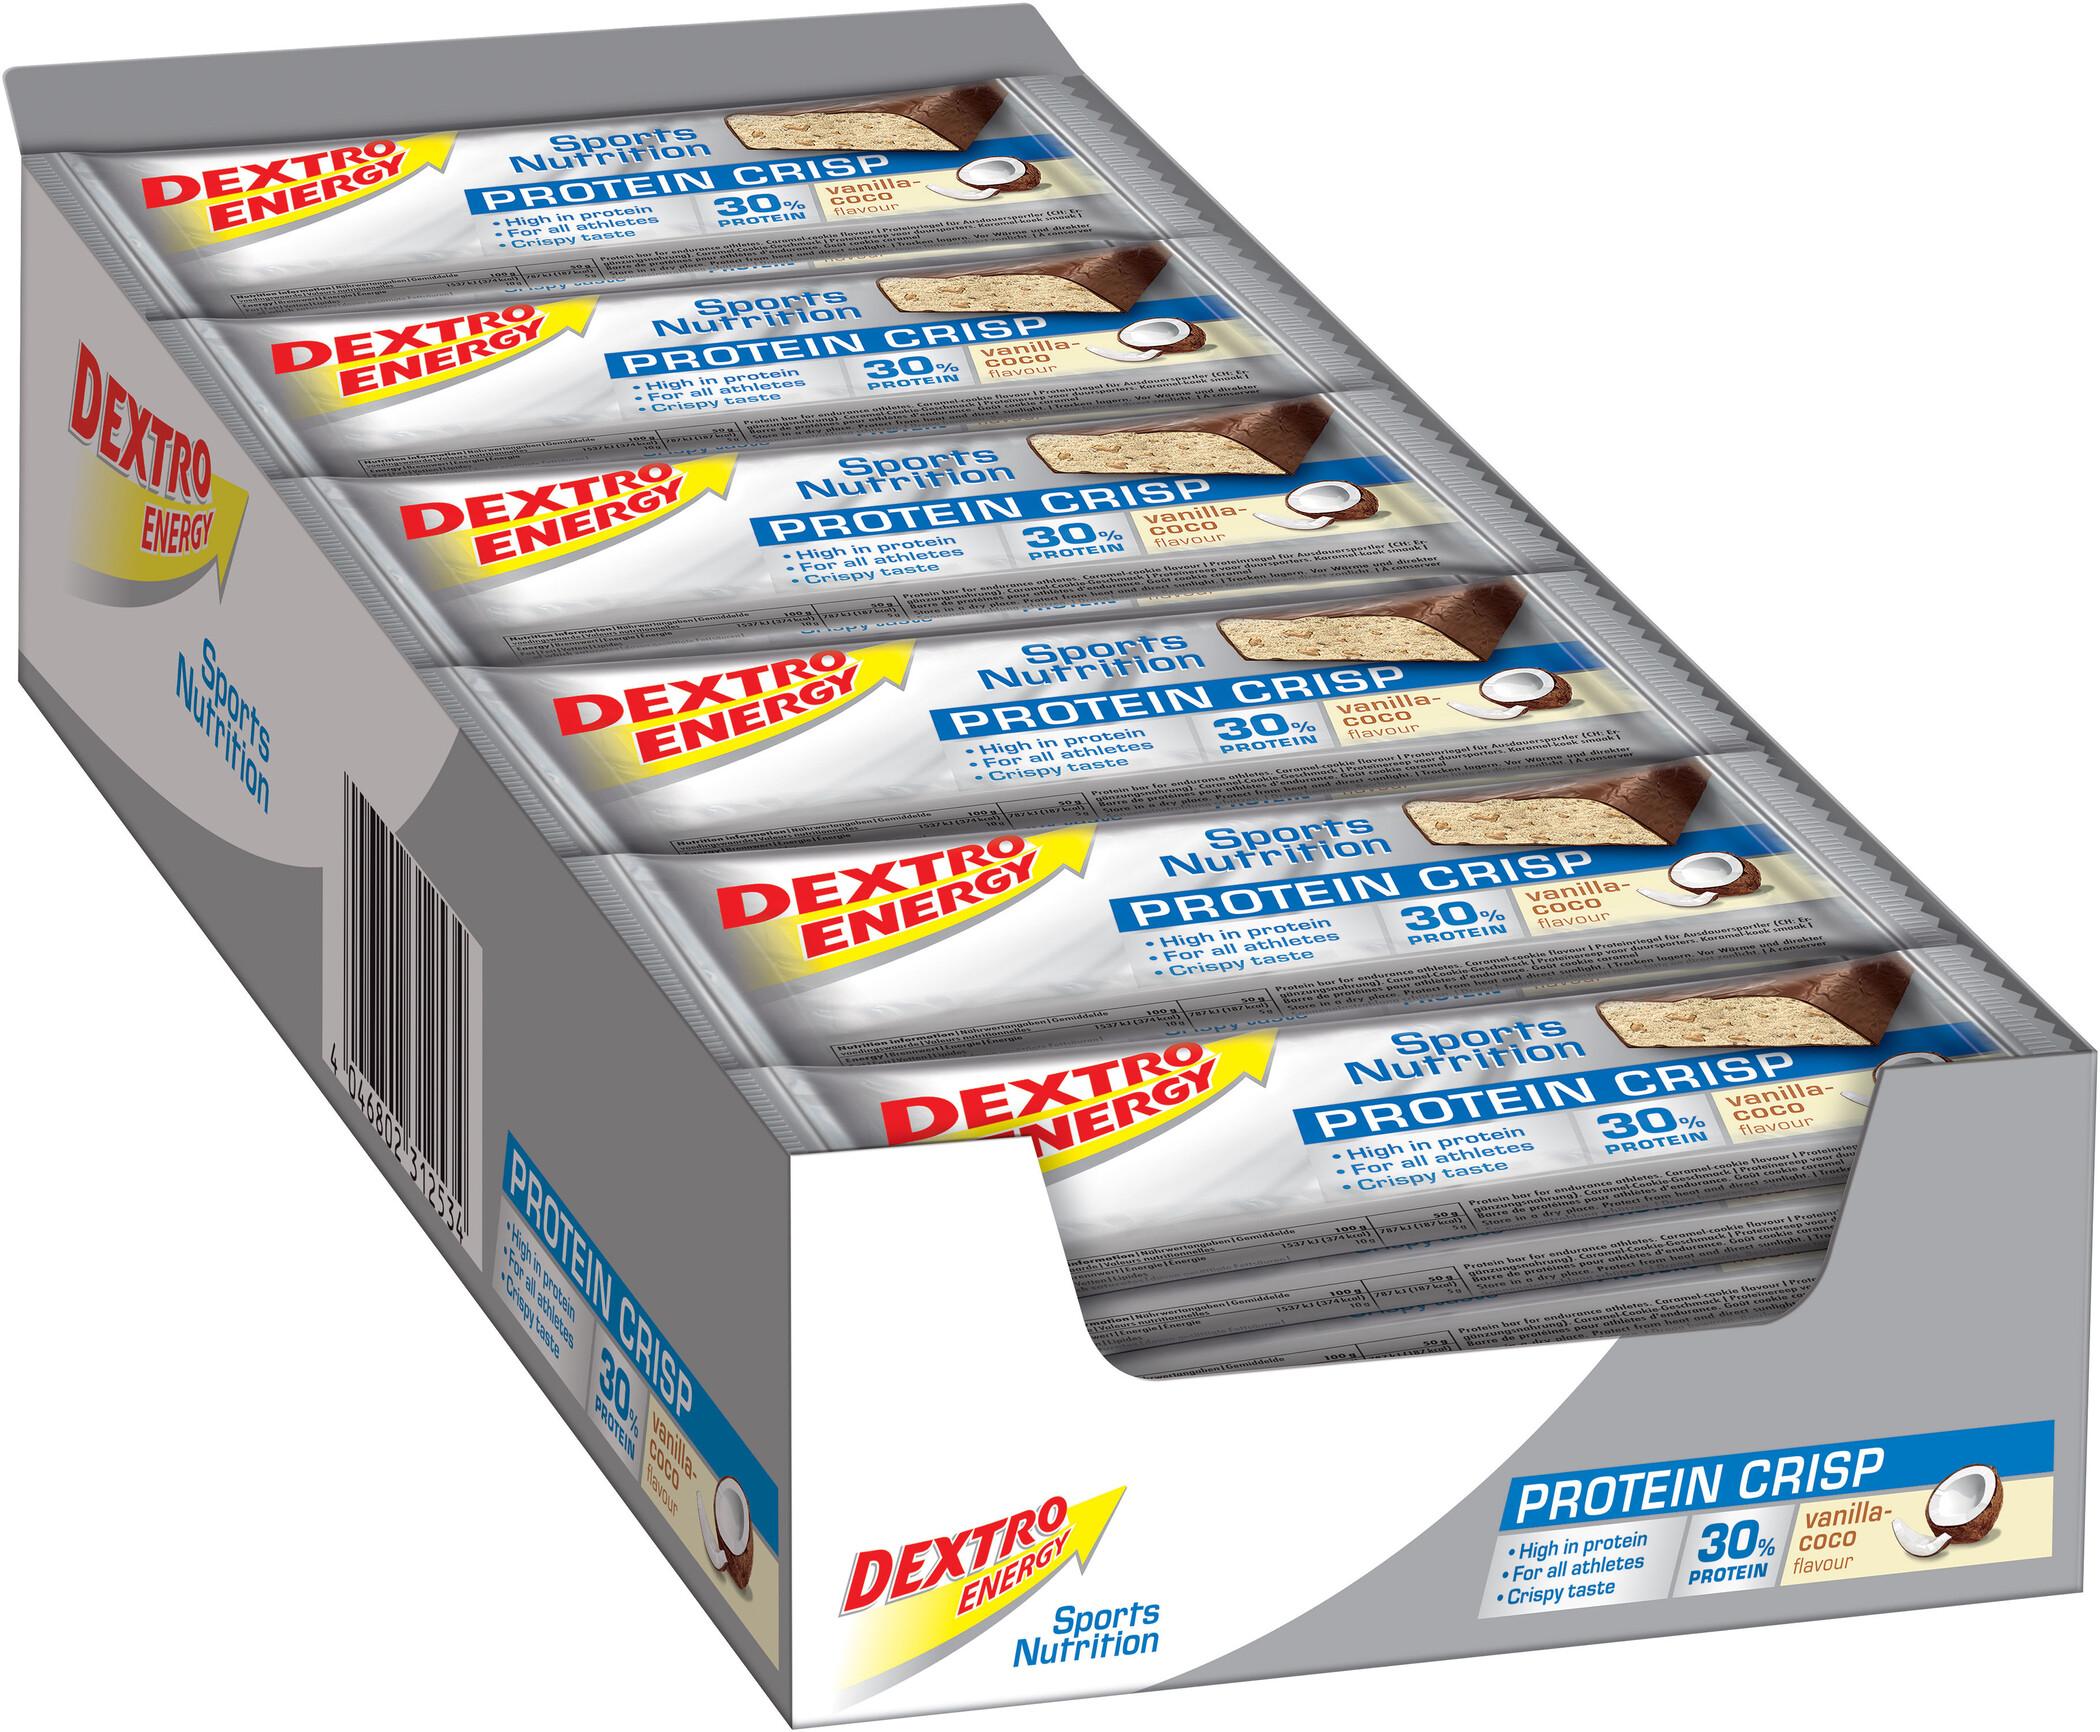 Dextro Energy Protein Crisp Box 24x50g, Vanilla-Coconut (2019) | Protein bar and powder